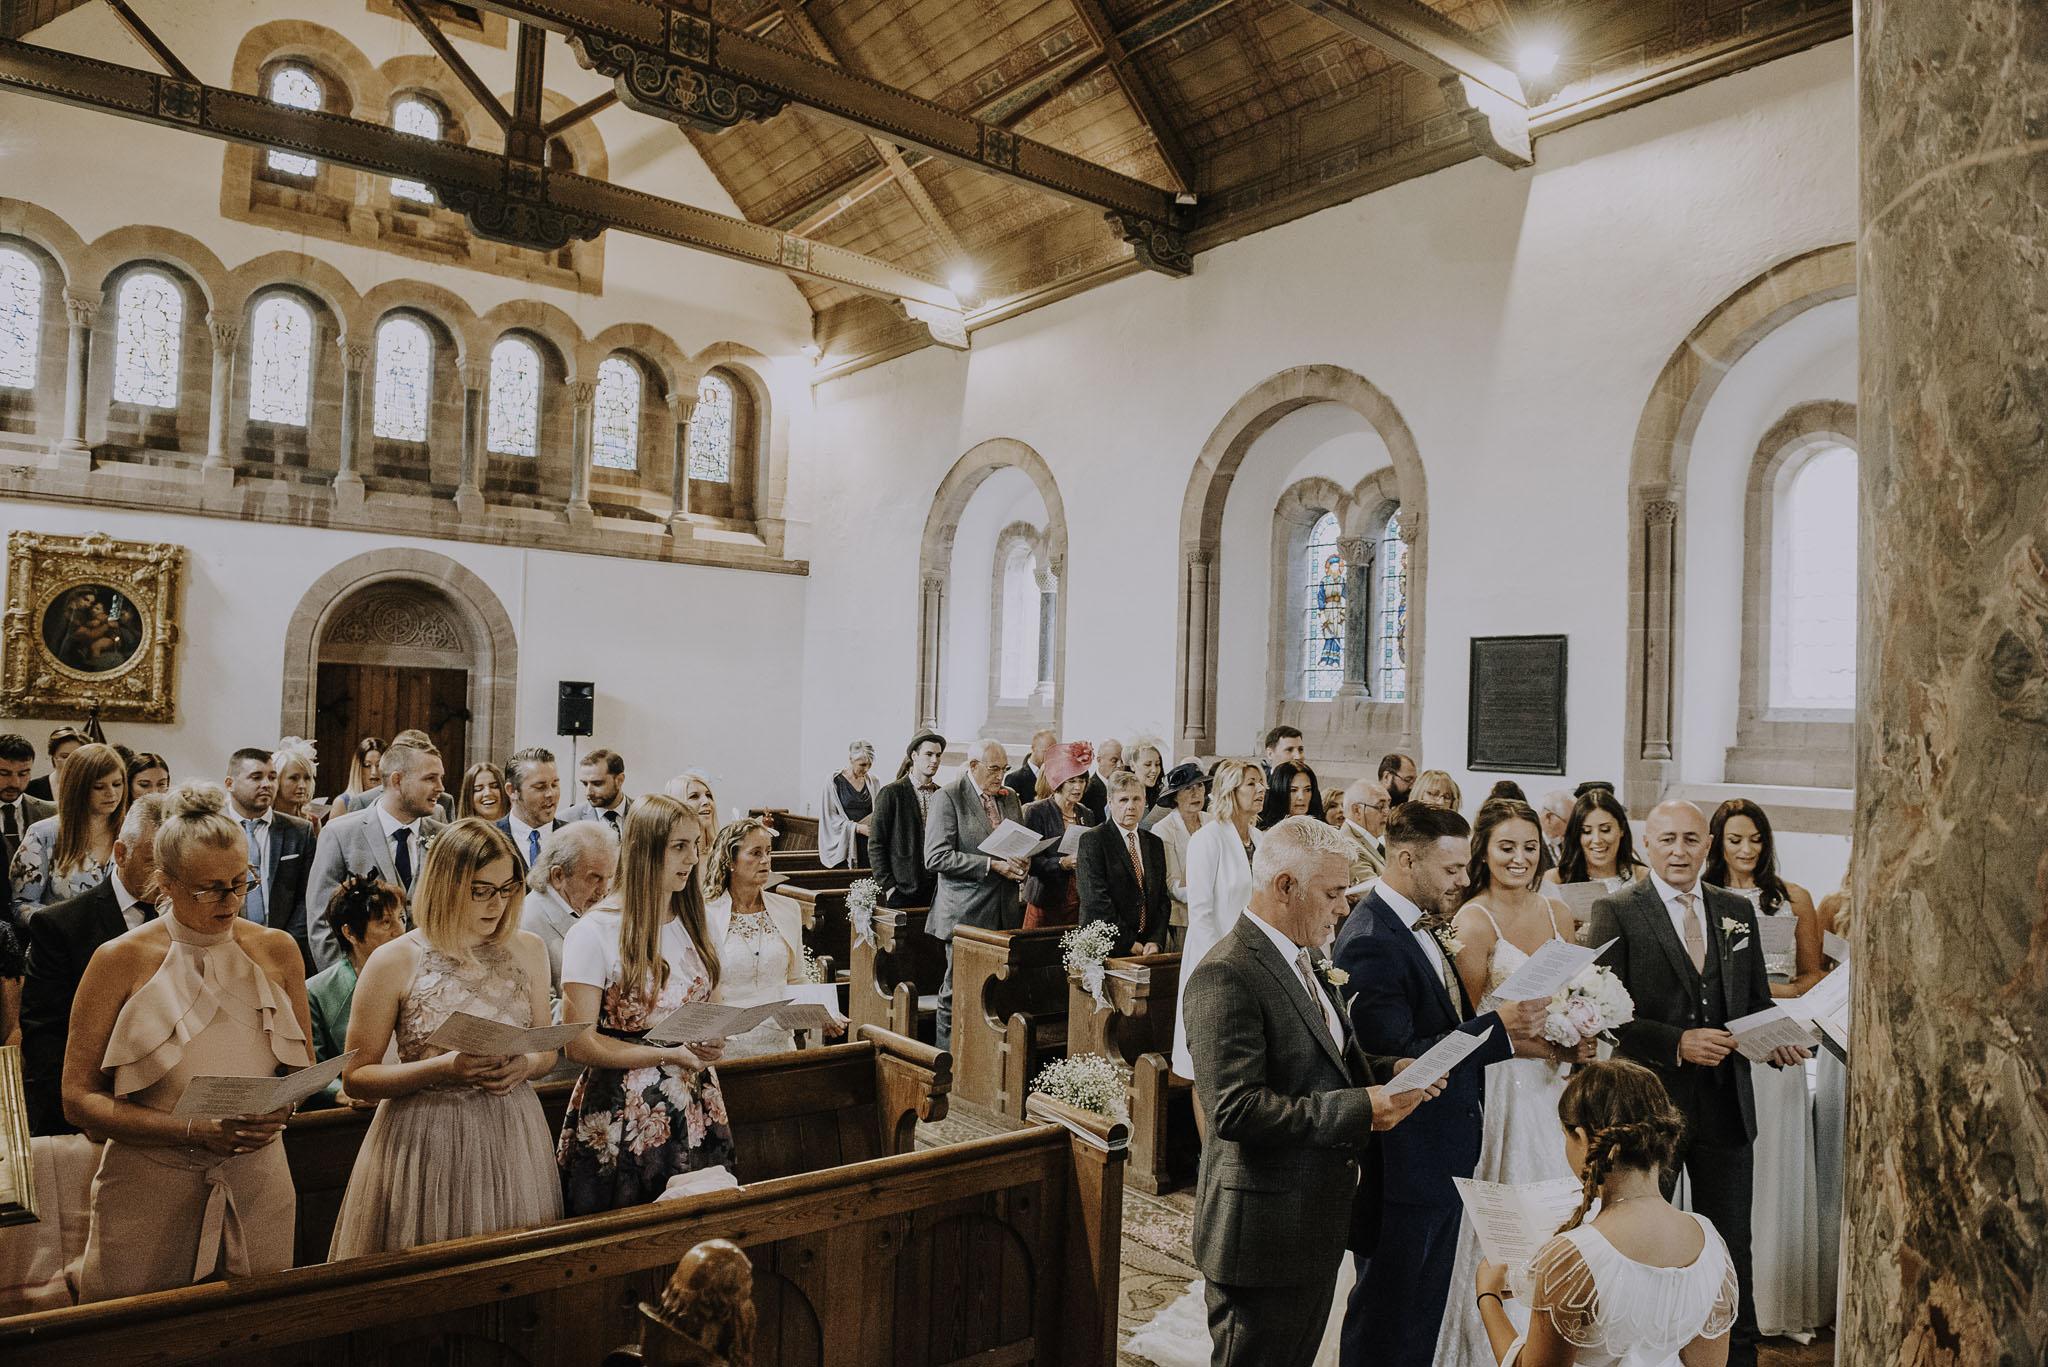 wedding-photographer-glewstone-court-hereford-scott-stockwell-photography177.jpg